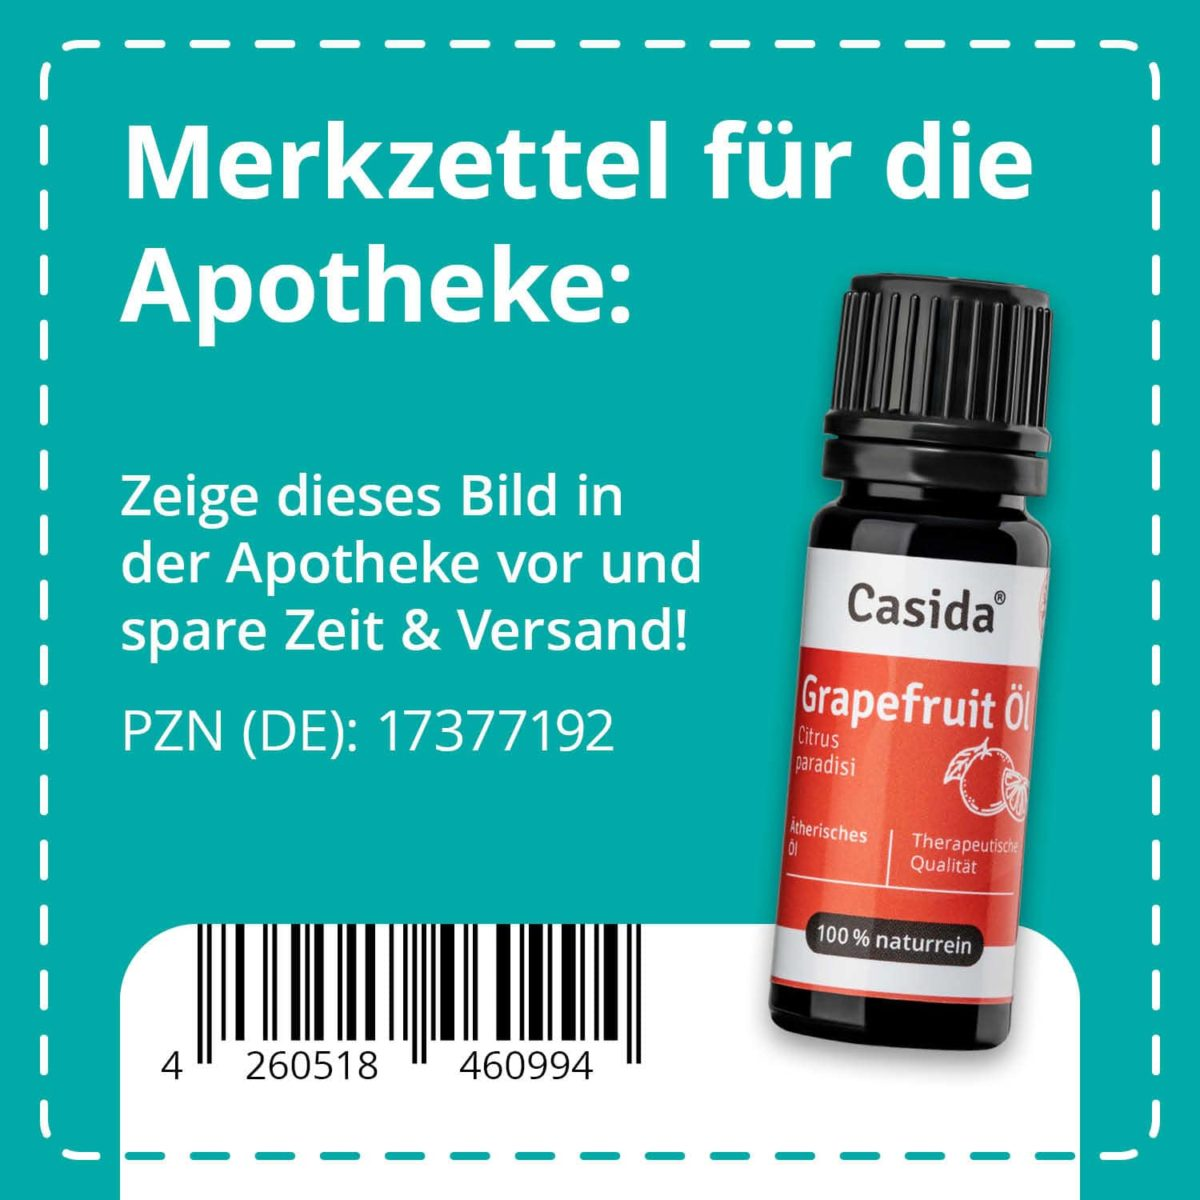 Casida Grapefruit Öl - 10 ml citrus paradisi naturrein 17377192 PZN Apotheke EAN 4260518460994